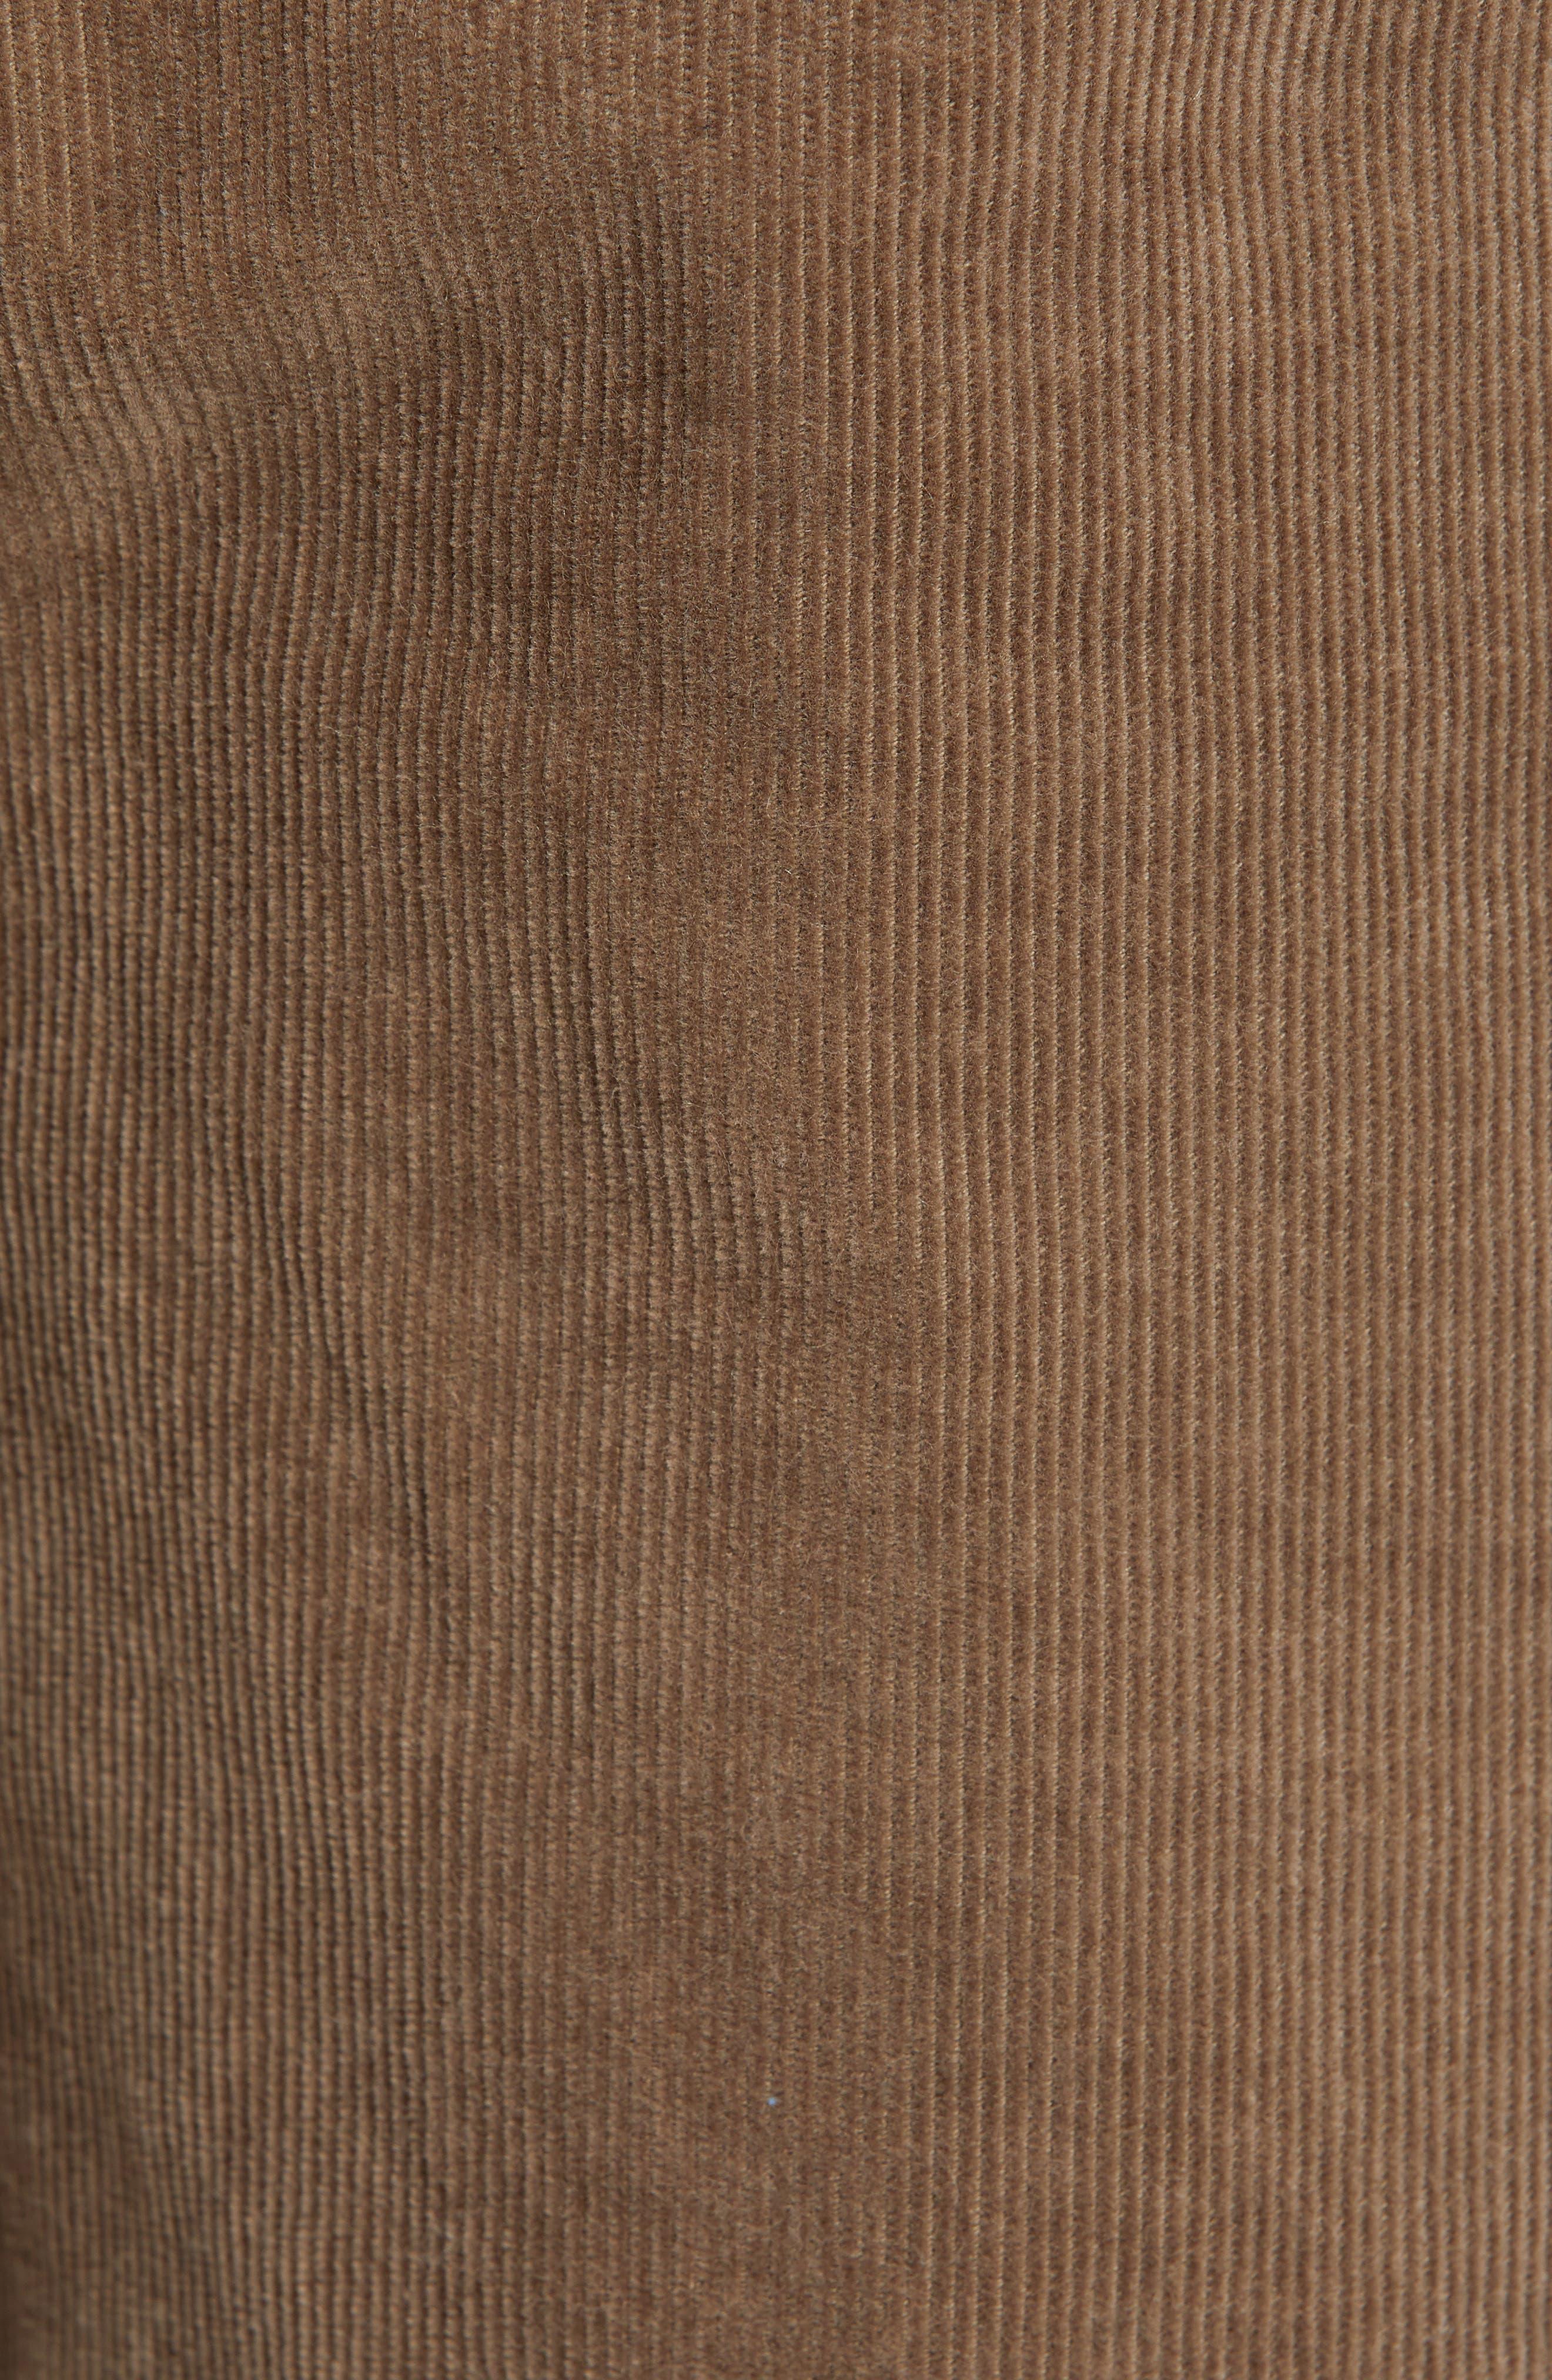 Solver Straight Leg Corduroy Pants,                             Alternate thumbnail 5, color,                             MUSHROOM